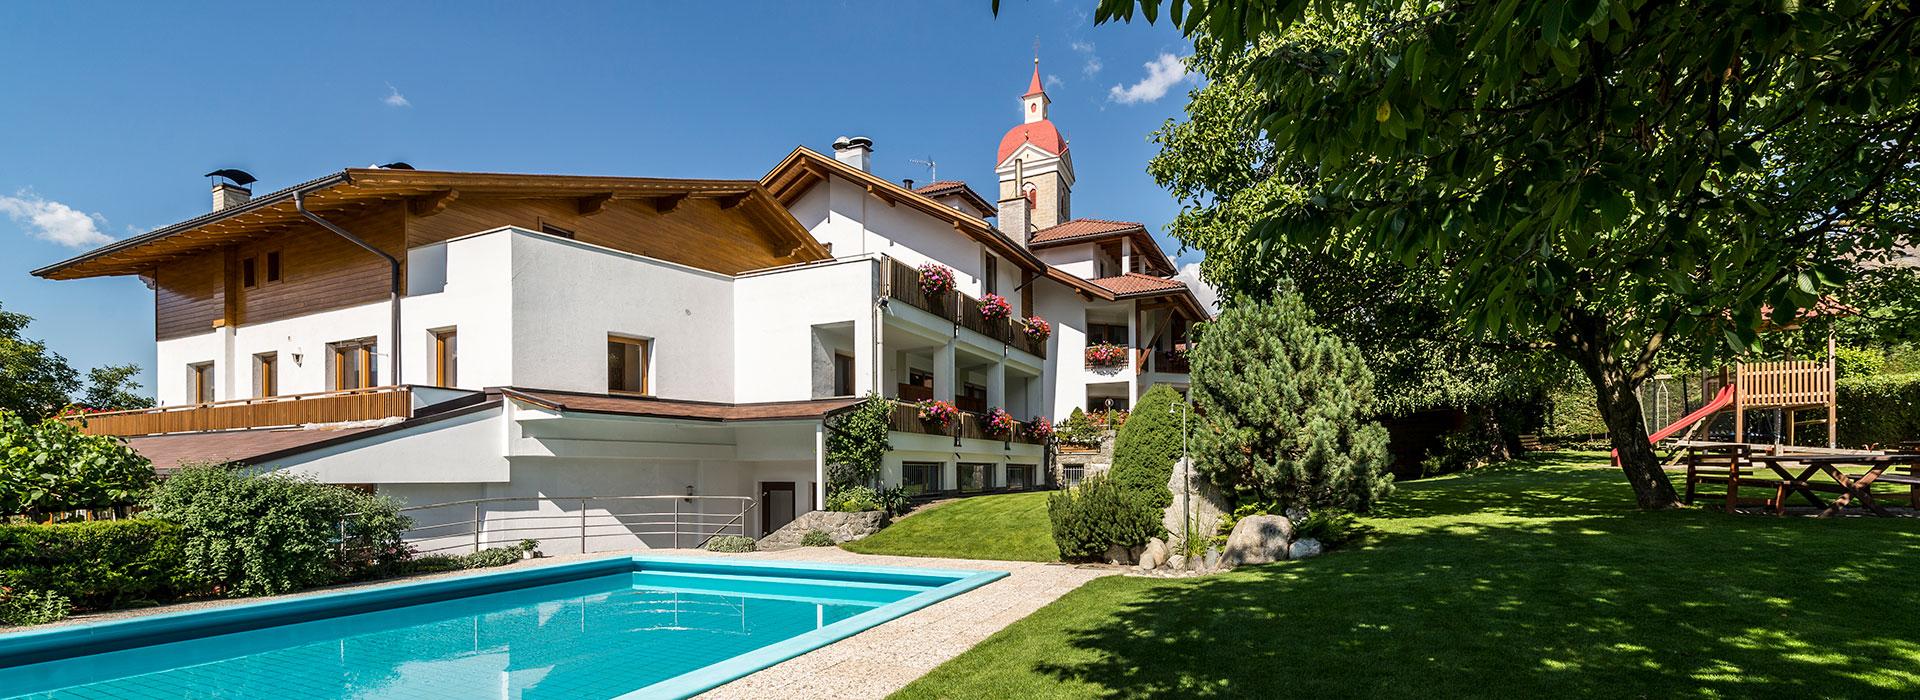 hotel-birkenbrunn